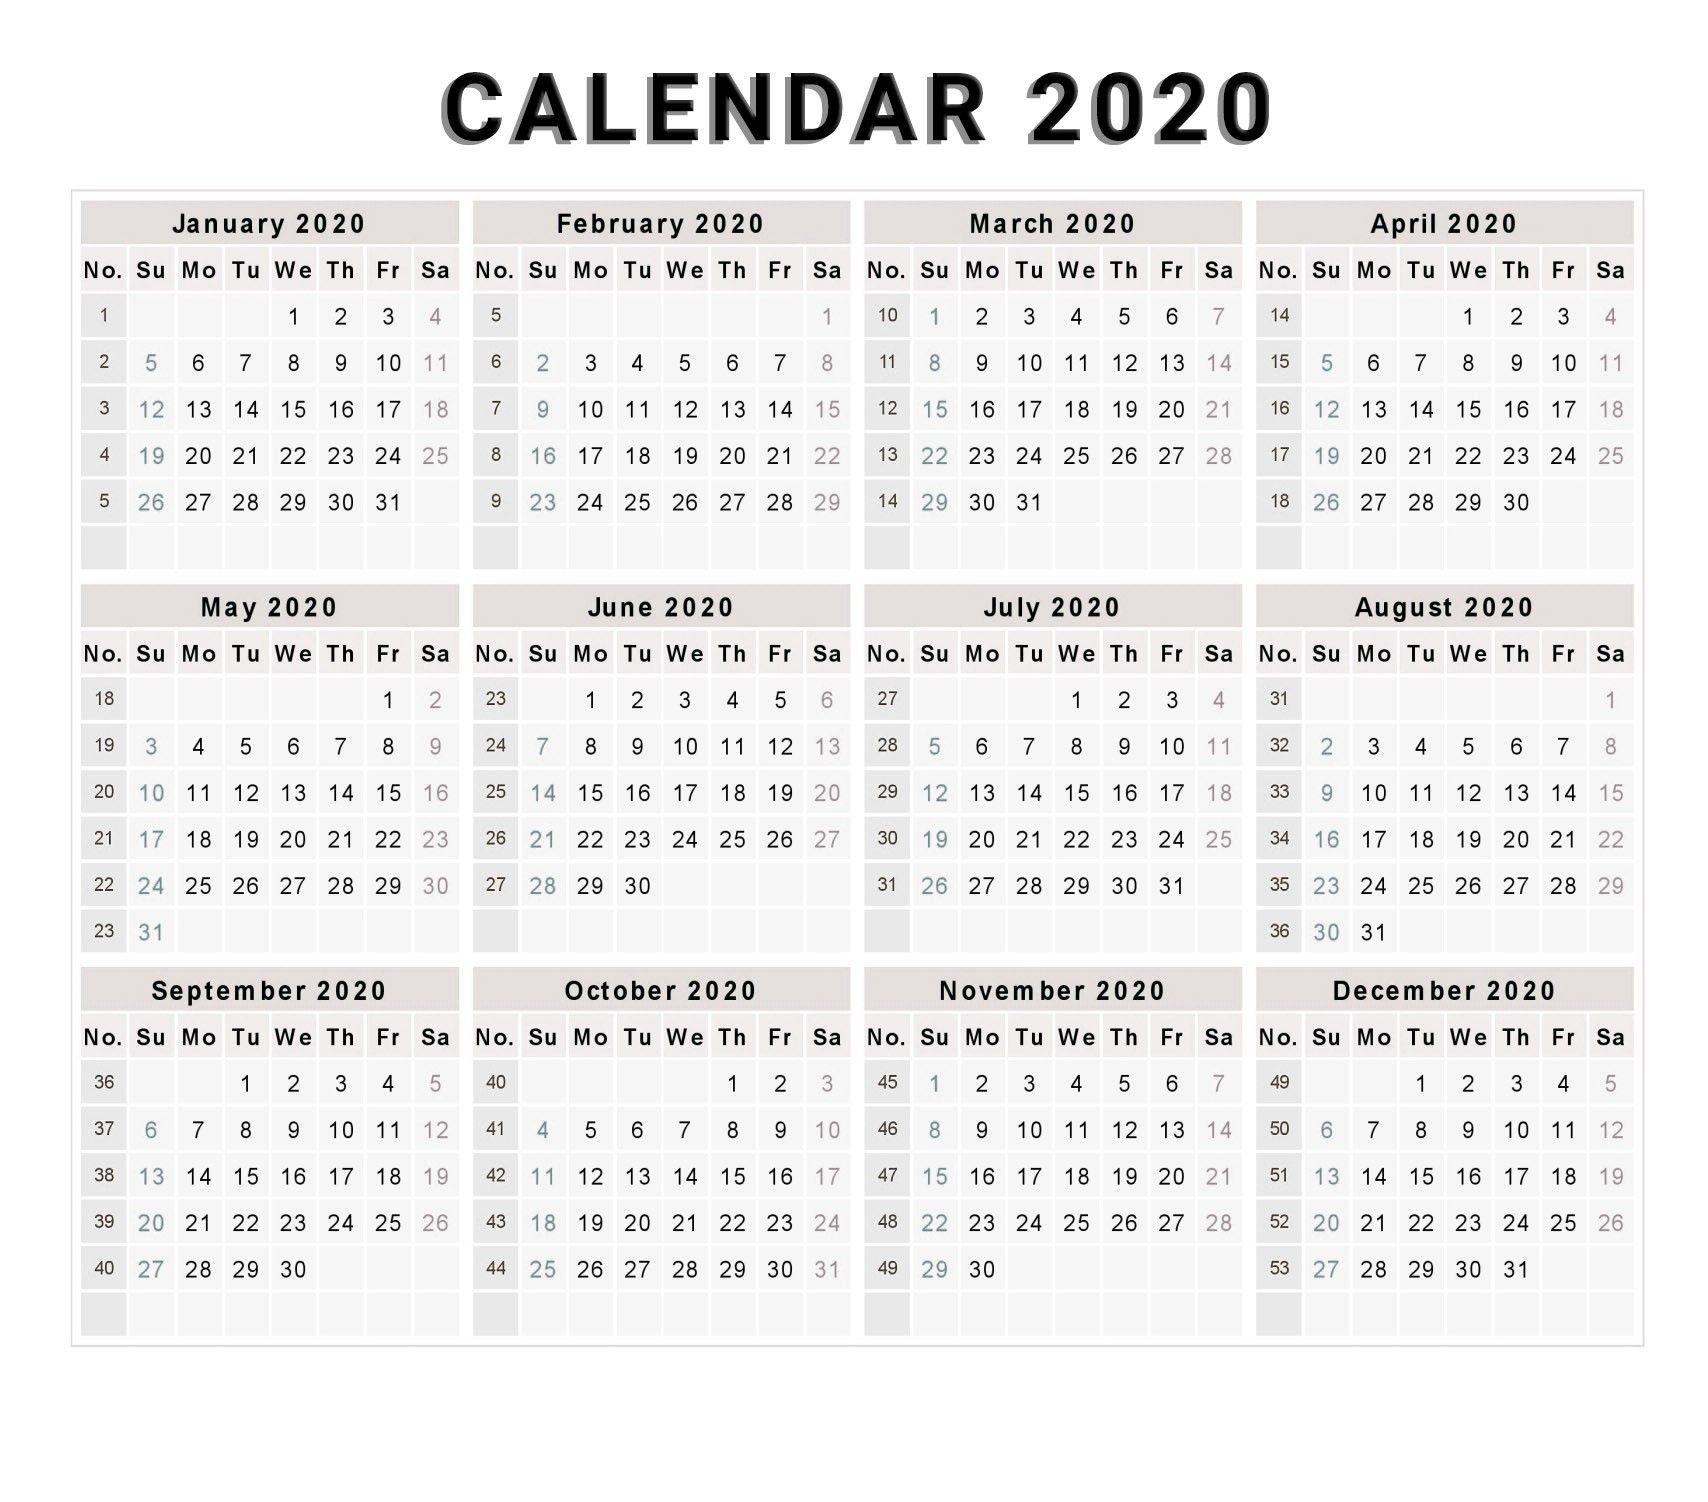 Calendar 2020 Free Printable Calendar 2020 Free 2020 in Free 2020 Calander Sunday To Saturday